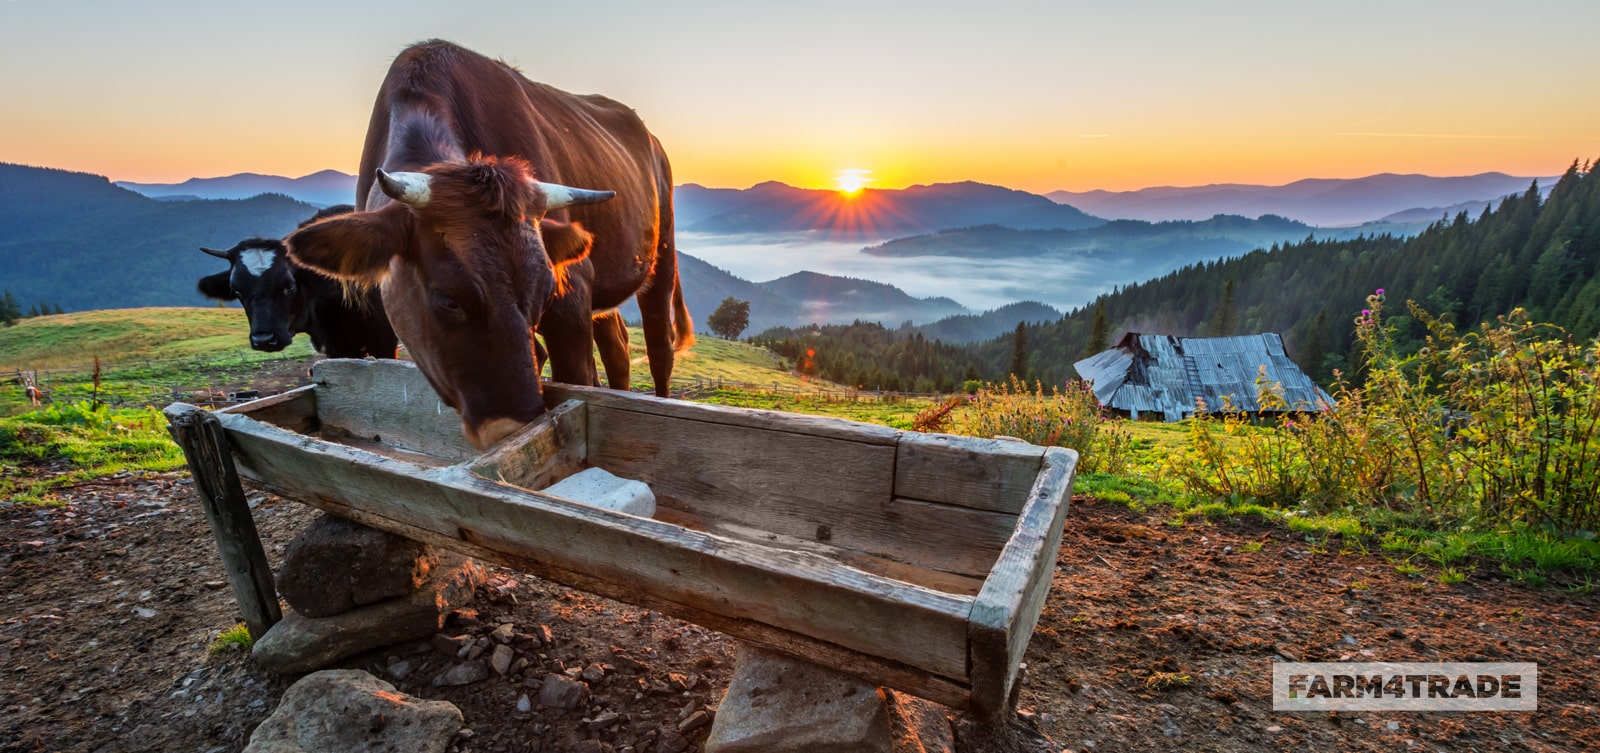 Farm4Trade-keep water troughs clean for healthier animals